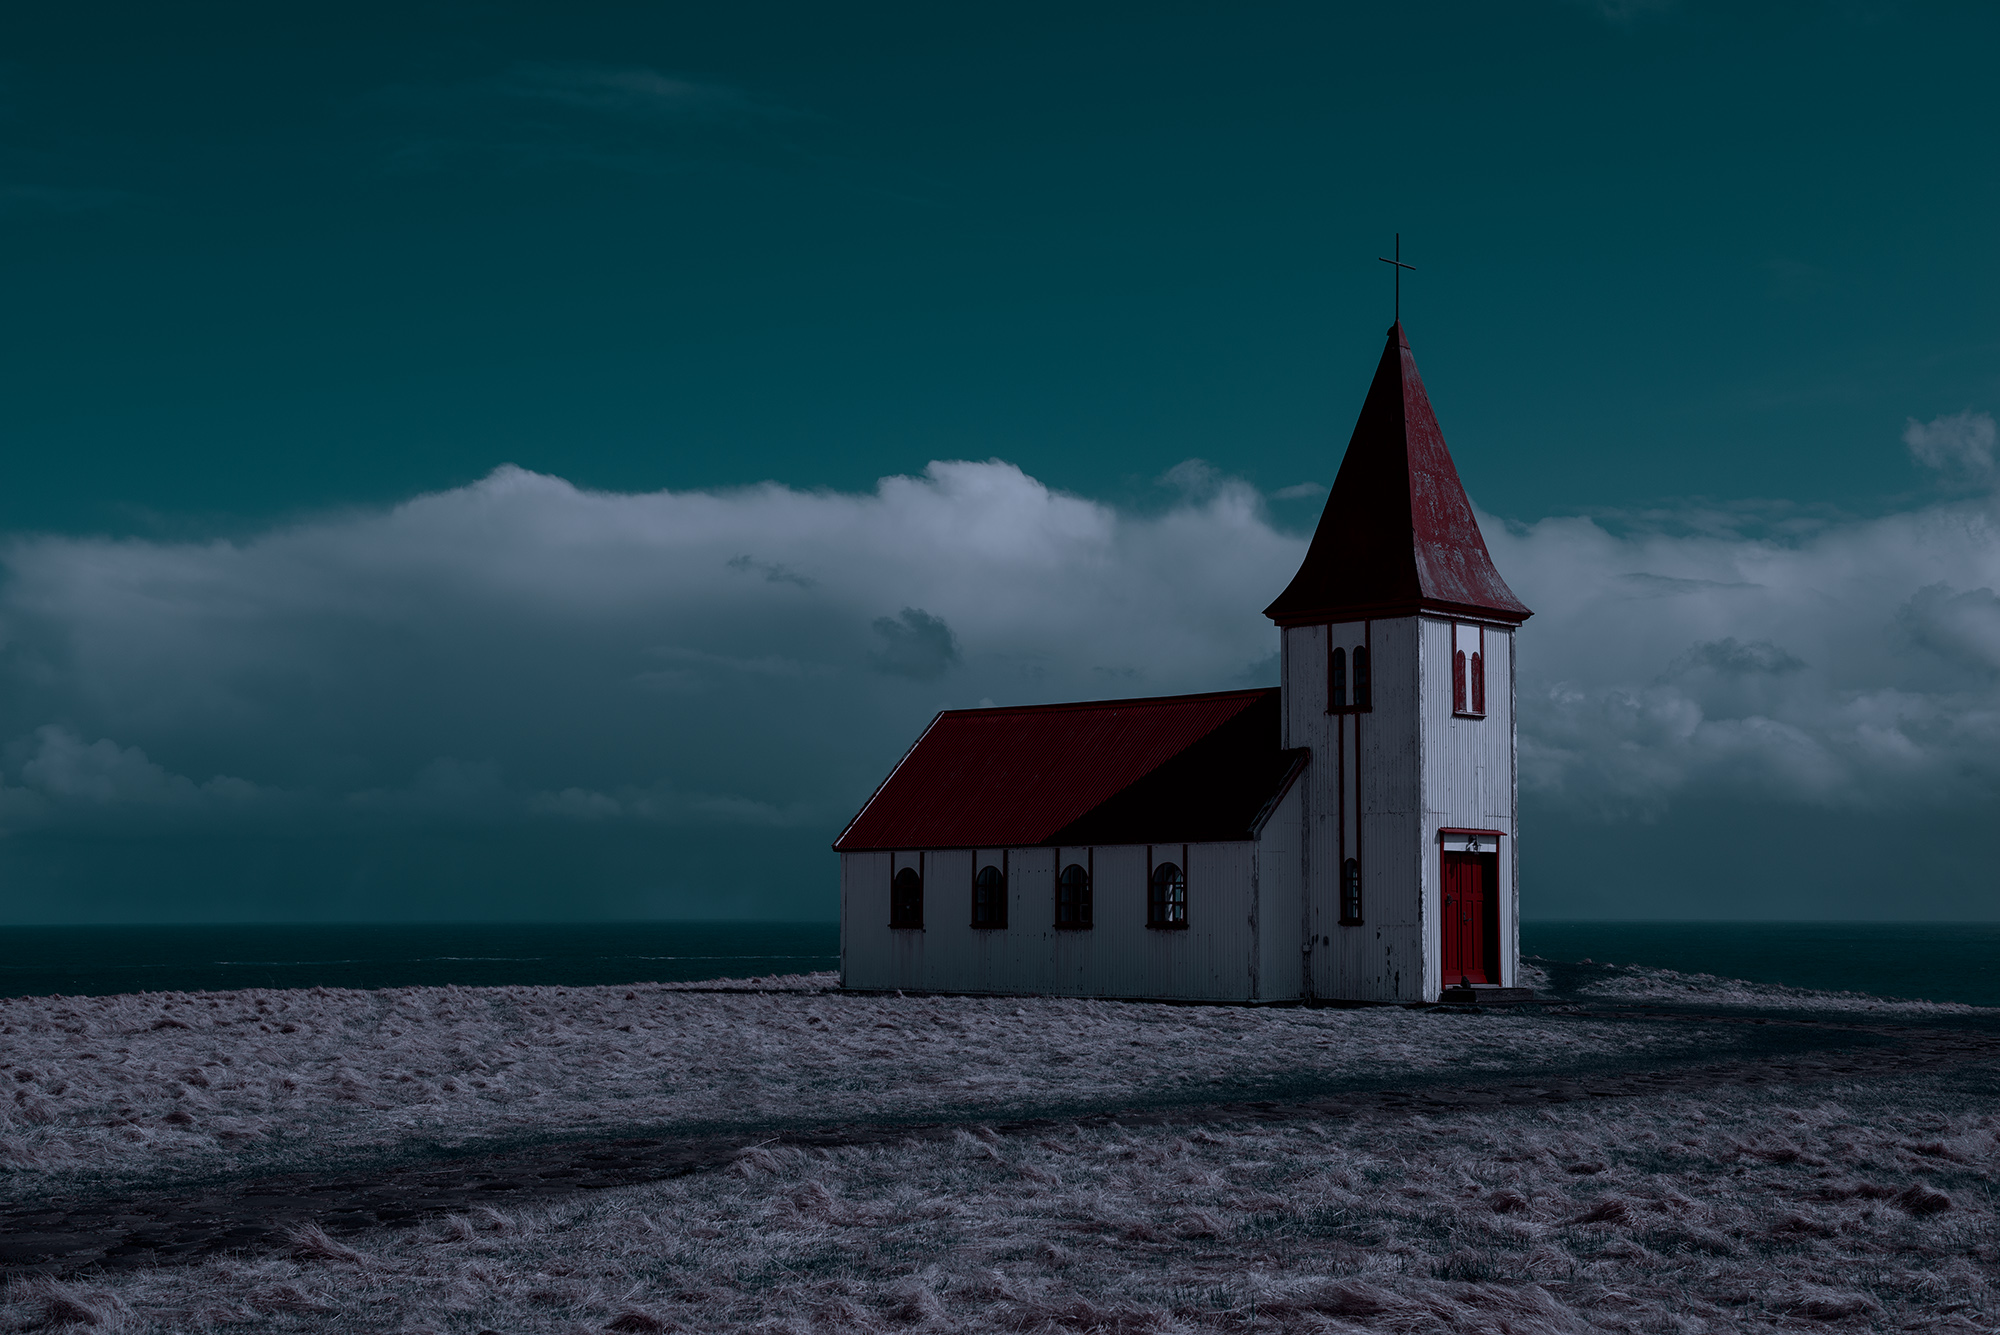 VL_Iceland_18_83027.jpg